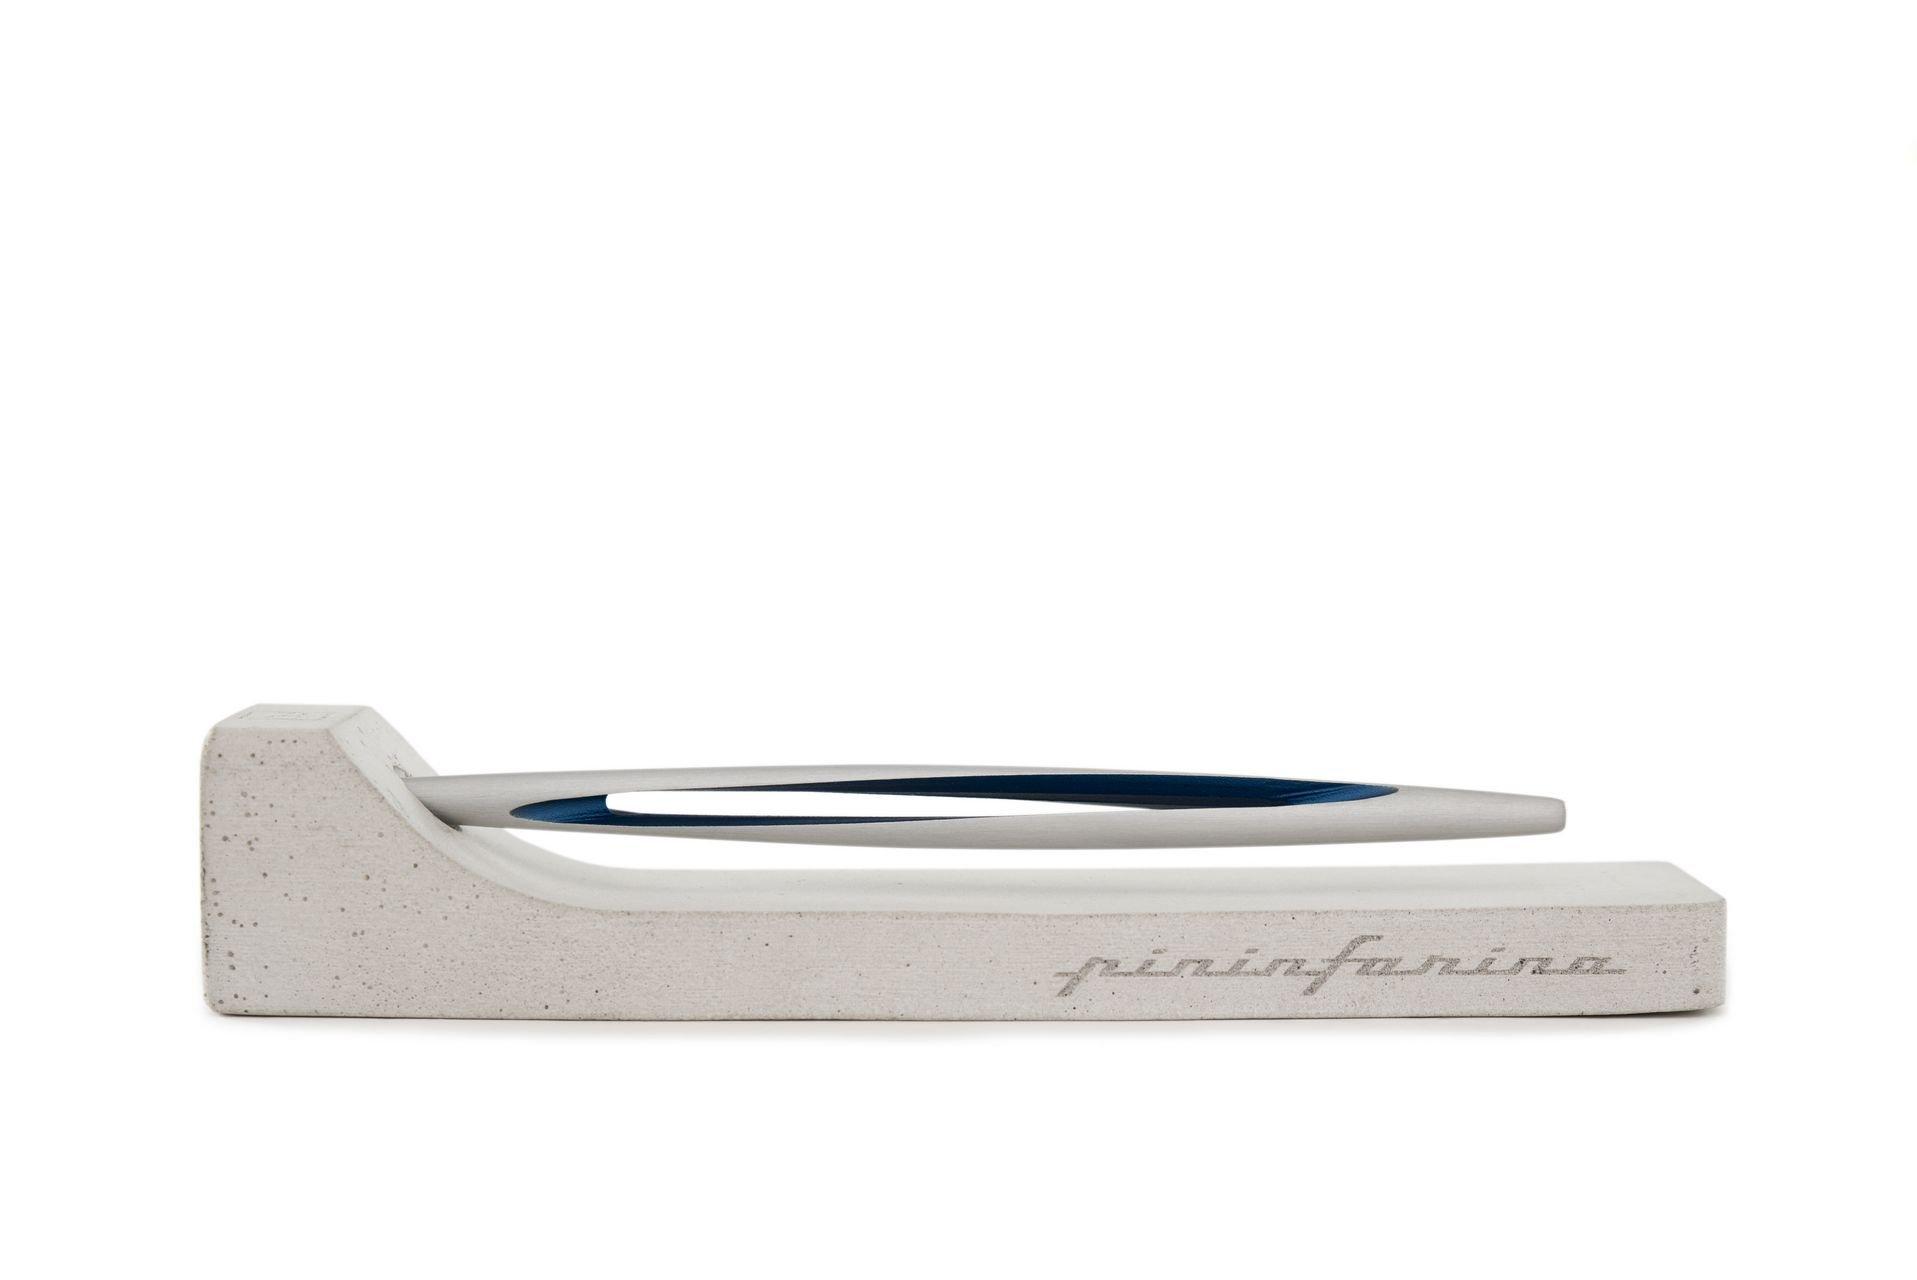 NAPKIN Pininfarina Aero Blue twisted Writing Instrument by Napkin